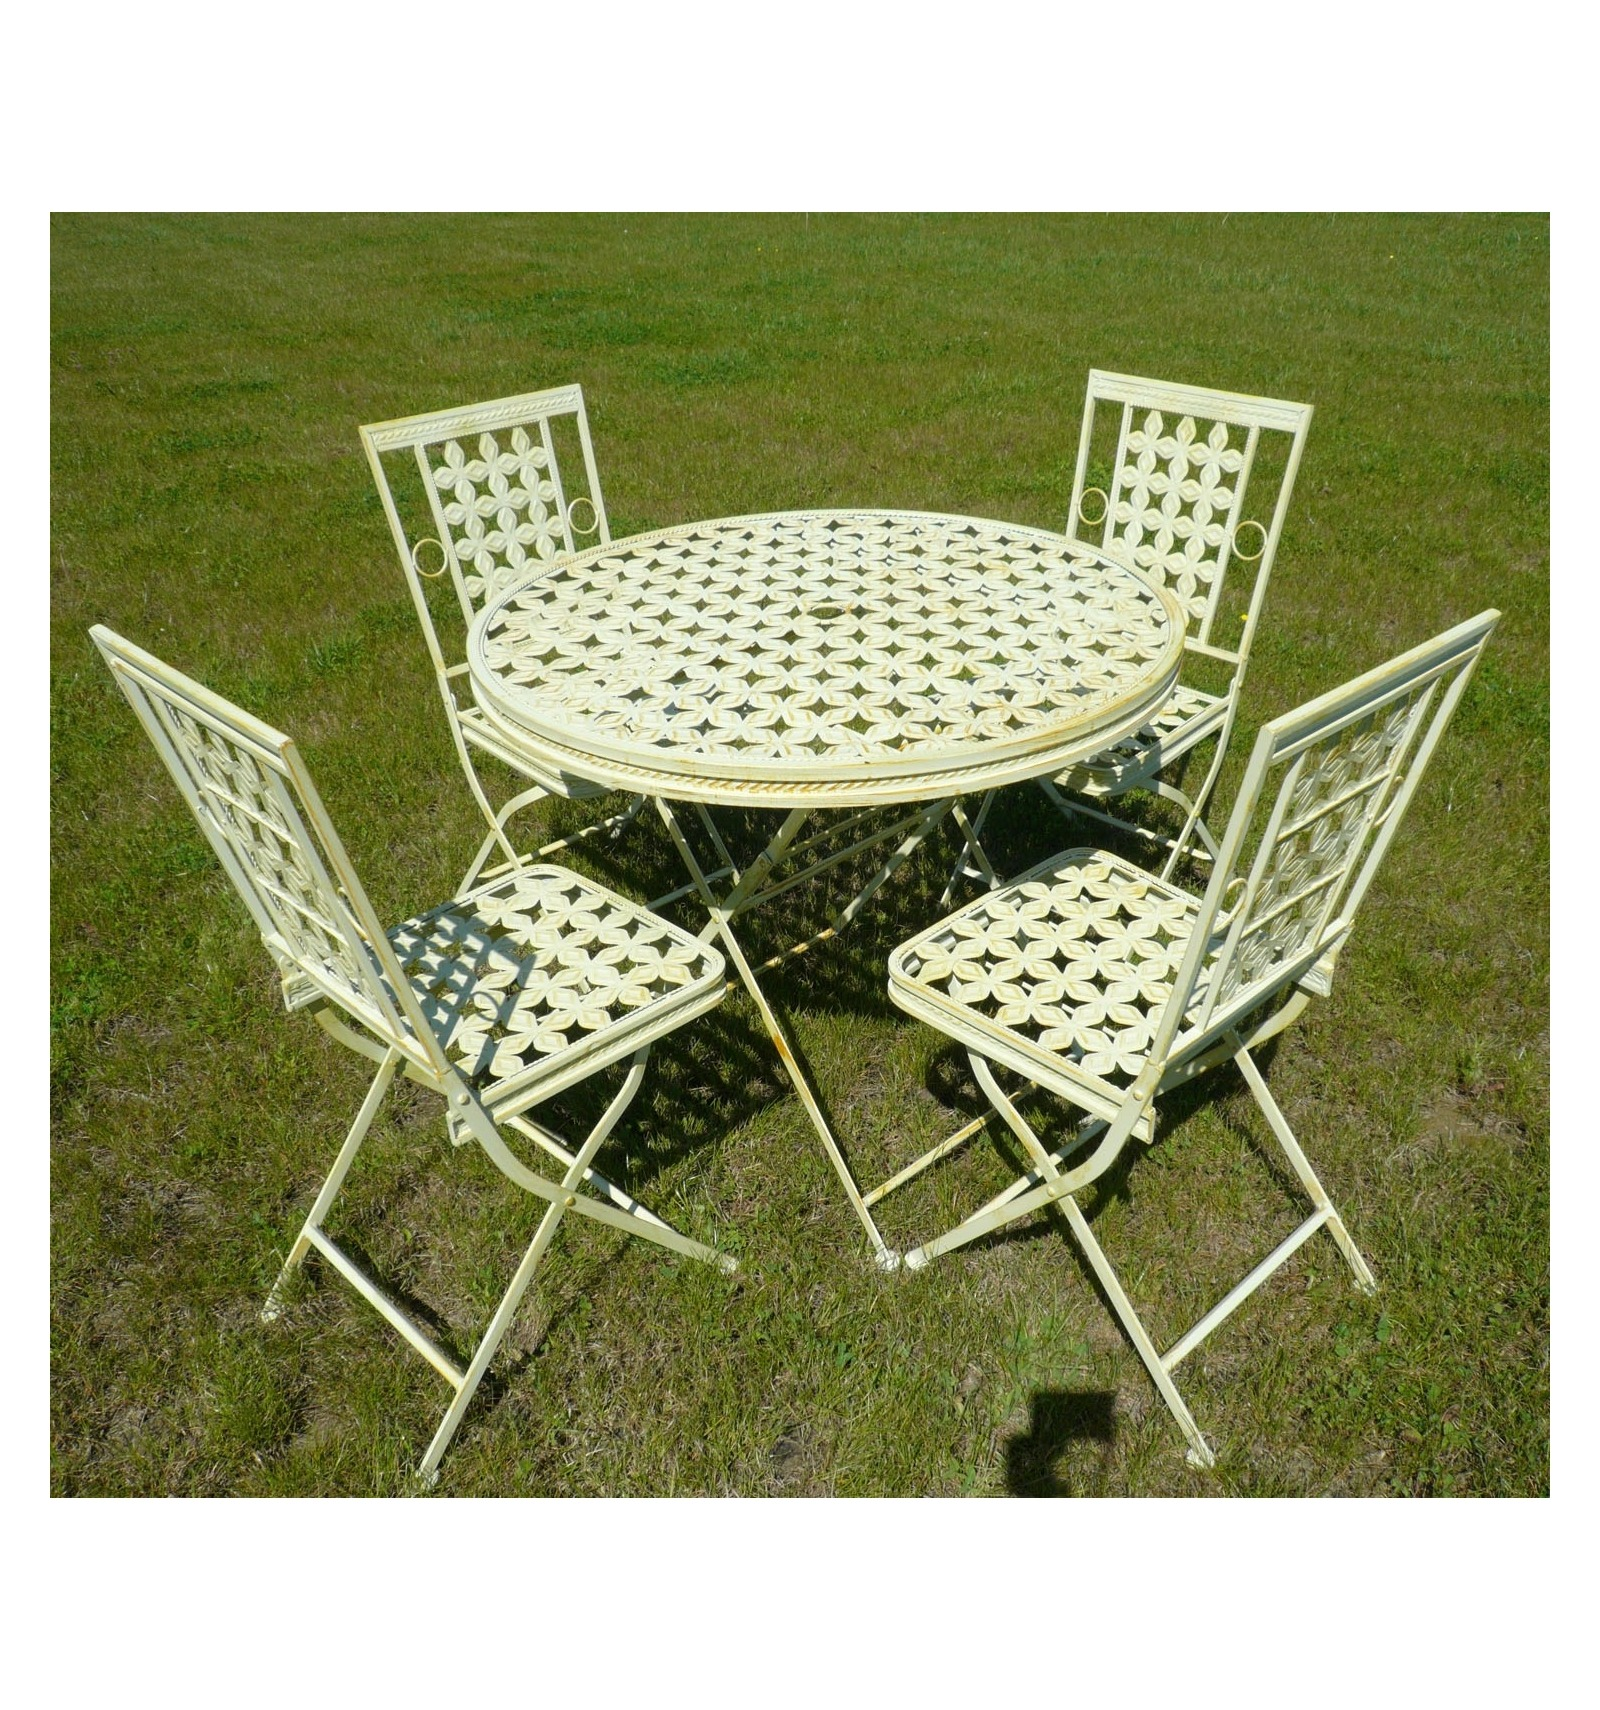 Salon de jardin en fer forg avec une table ronde et 4 chaises for Salon de jardin en fer forge